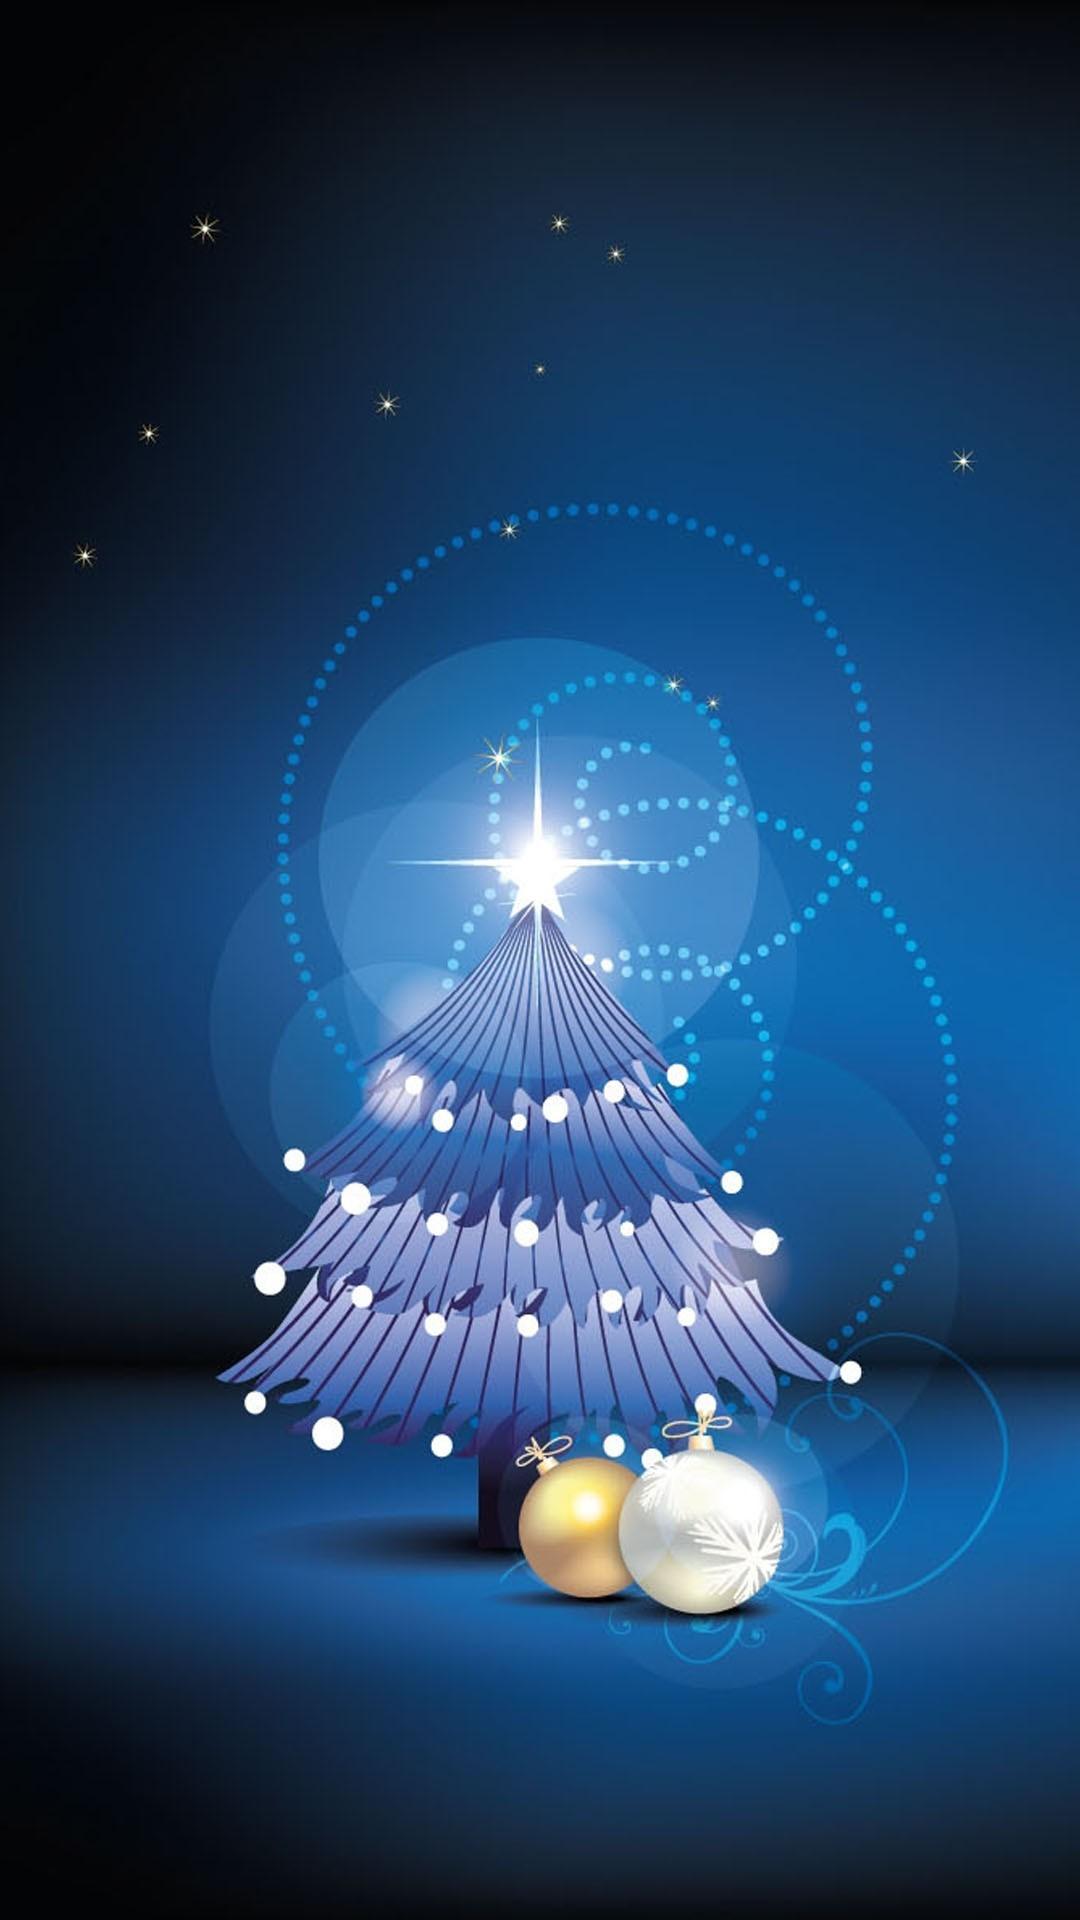 Night Christmas tree iPhone 6 plus wallpaper – stars